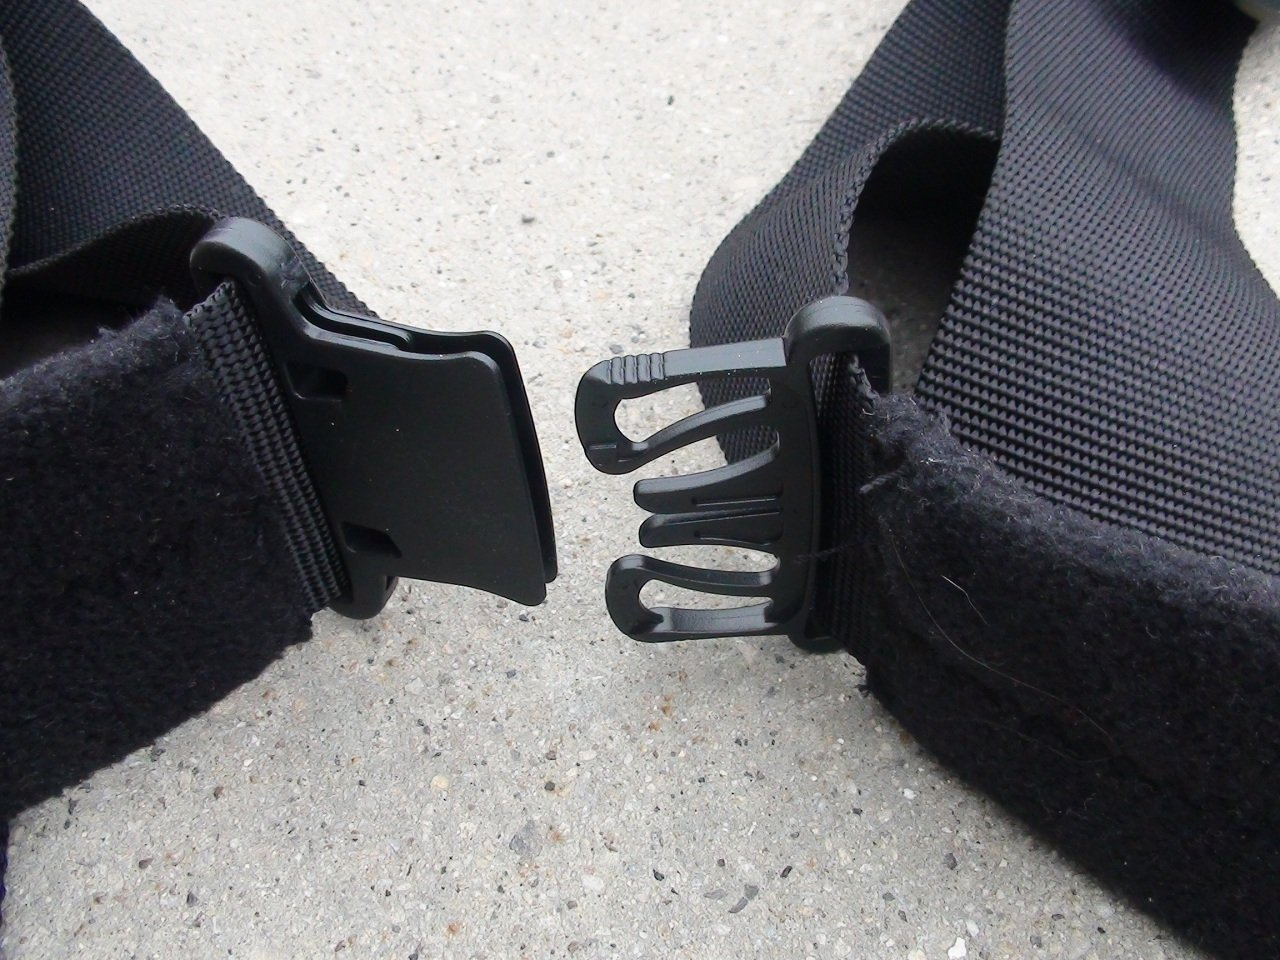 Got'urBack (Medium) Universal Back Support, Posture Correction Strap for a Better Back by Got'urBack (Image #8)